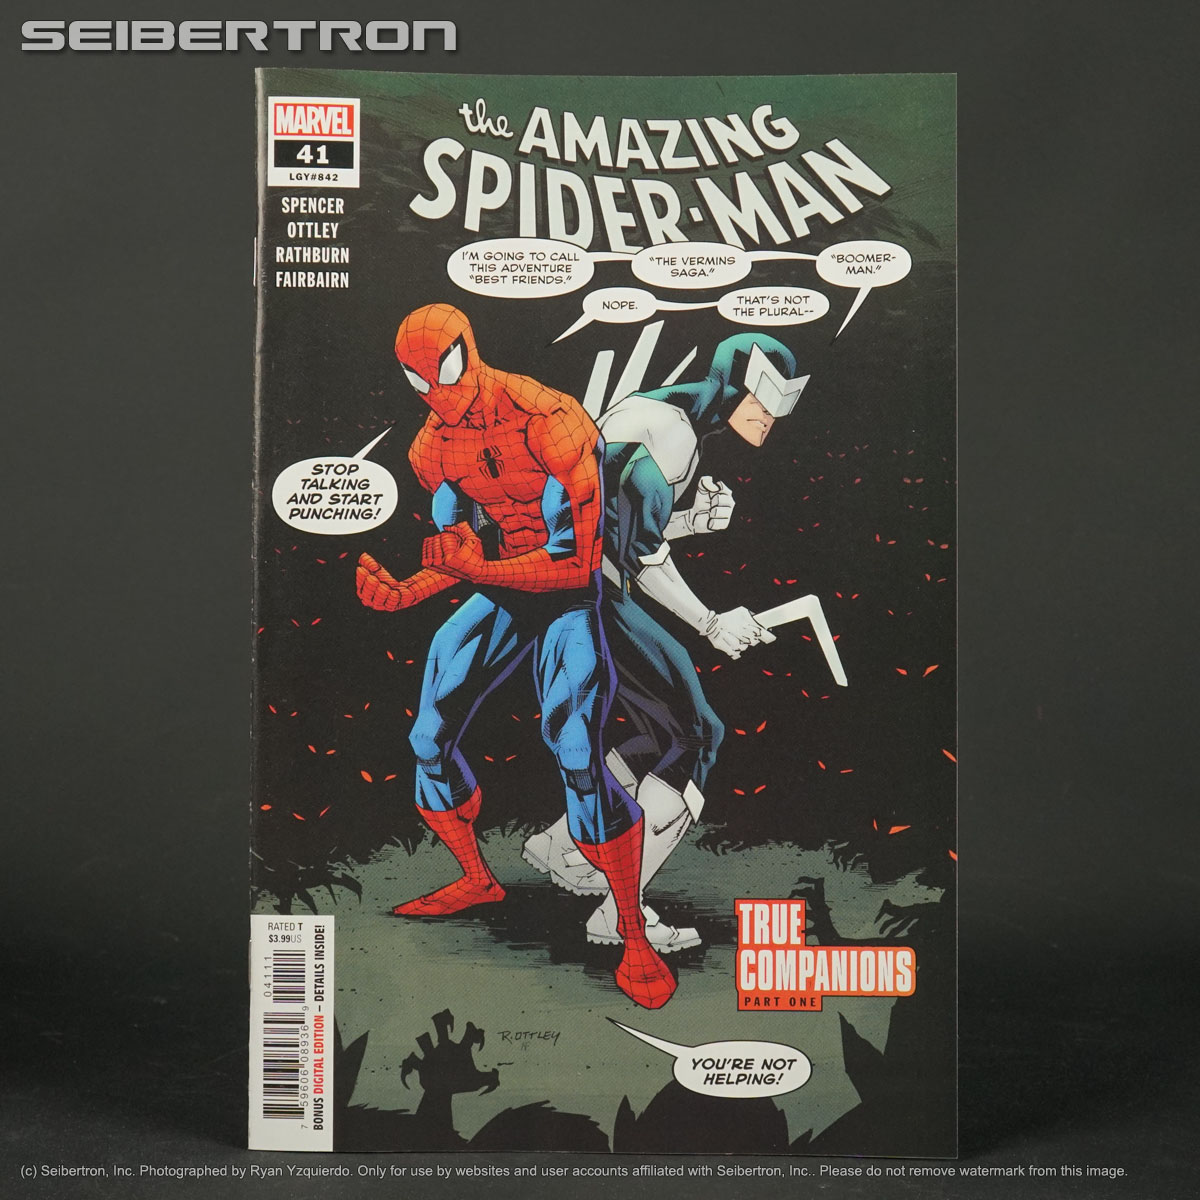 Amazing Spider-Man #16 Land Variant VF 2019 Stock Image